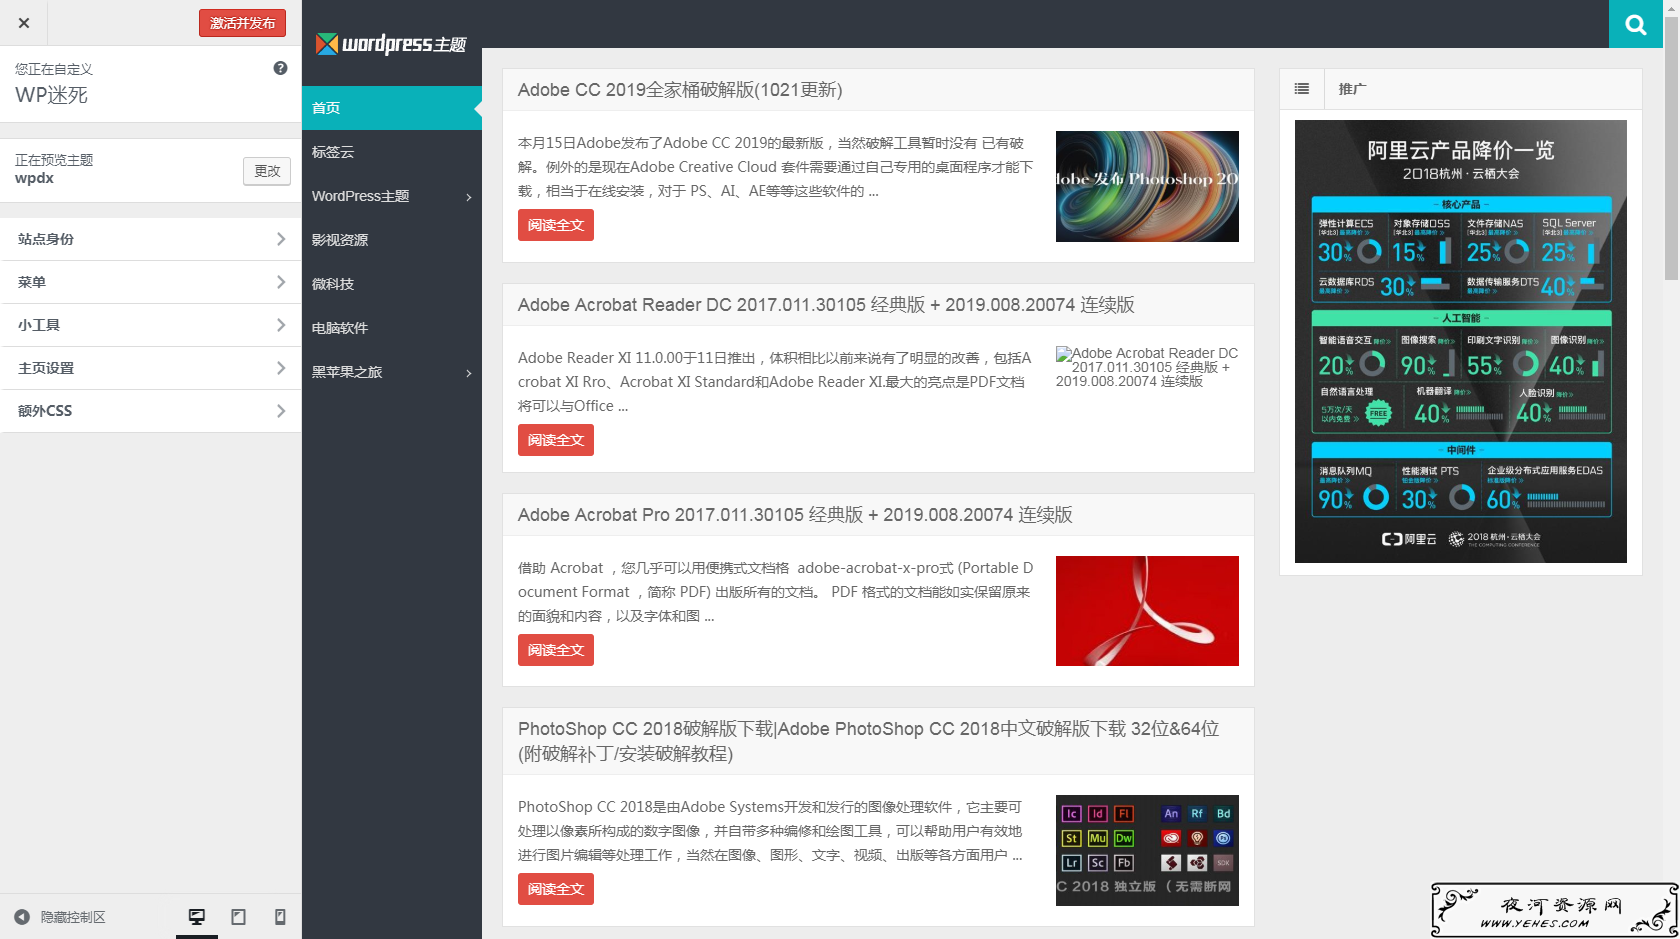 WordPress博客杂志CMS主题 wpdx3.6修复破解版完美seo优化